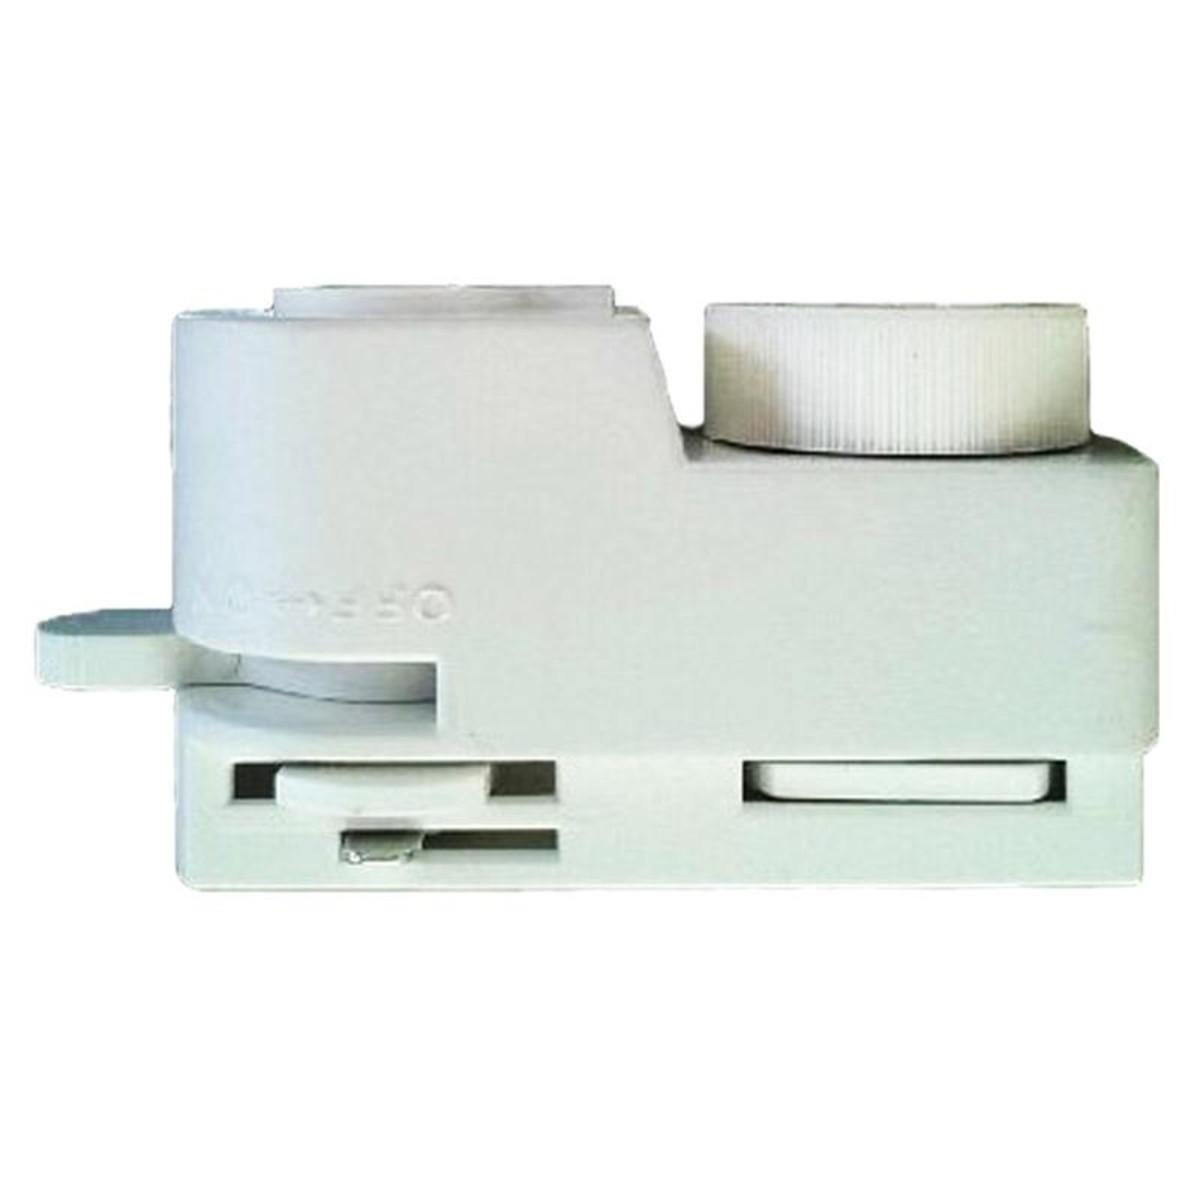 Адаптер для однофазного шинопривода Volpe UBX-Q122 UL-00006061 пластик